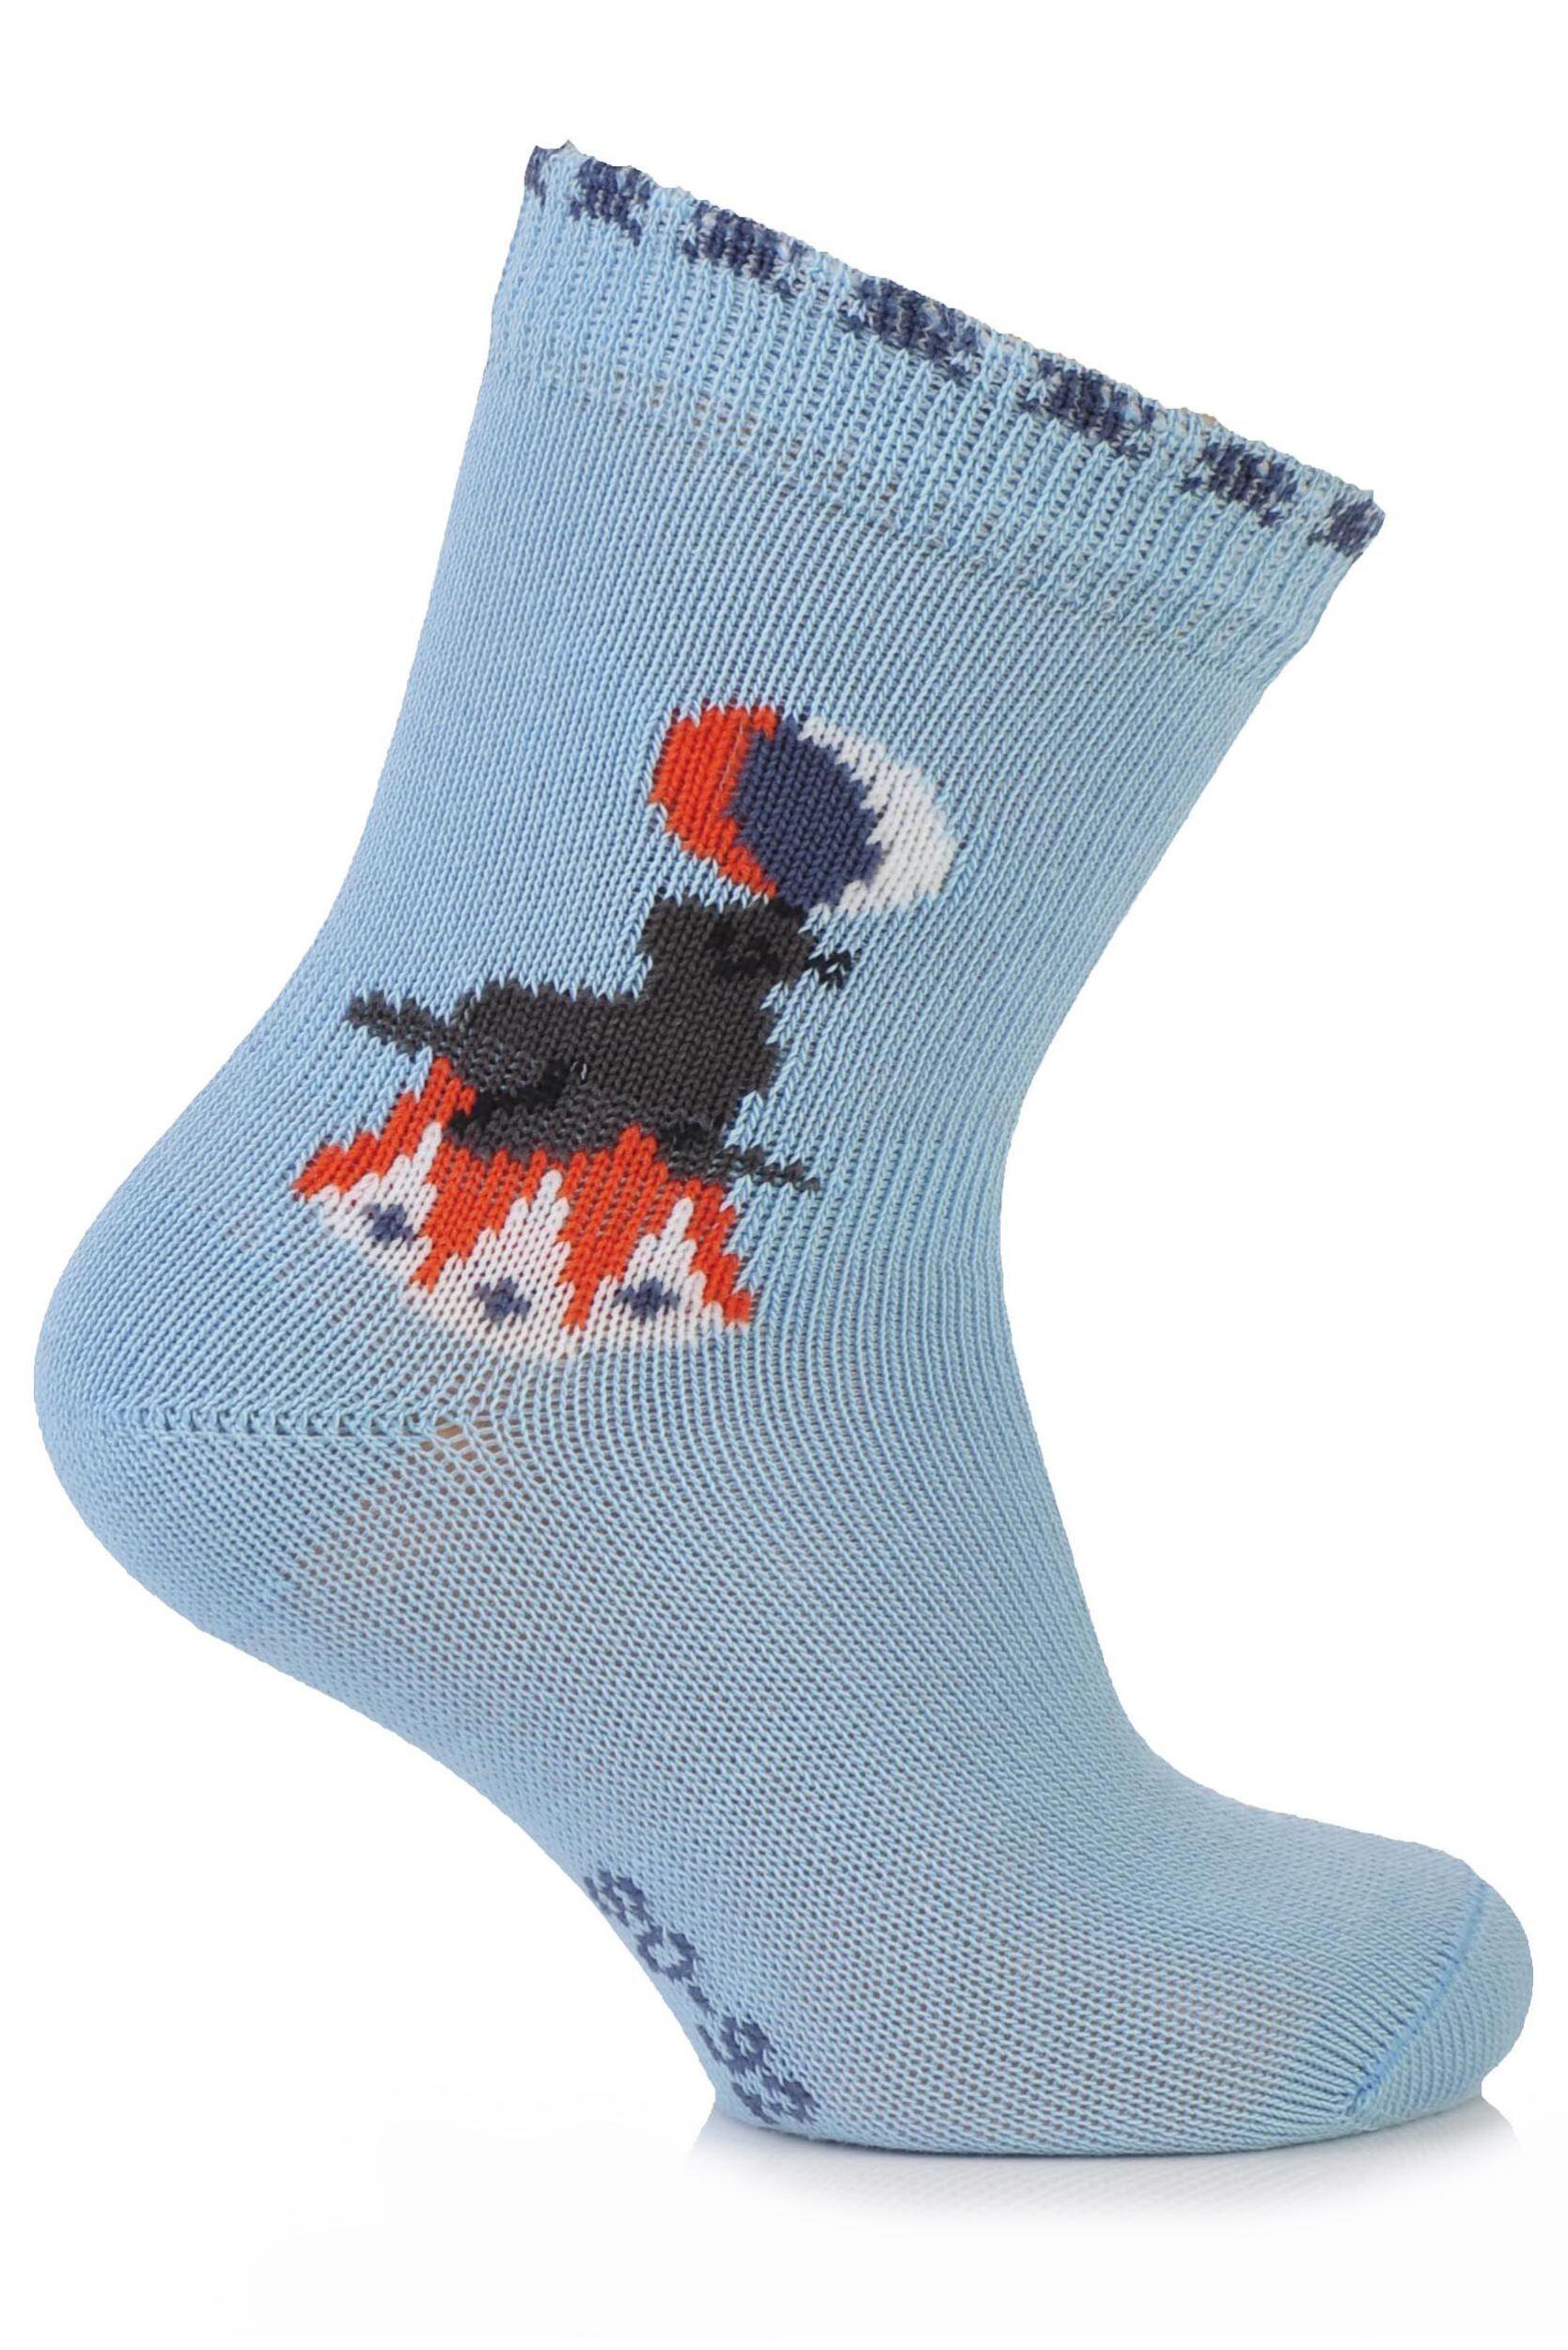 Image of Babies 1 Pair Falke Circus Seal Cotton Socks